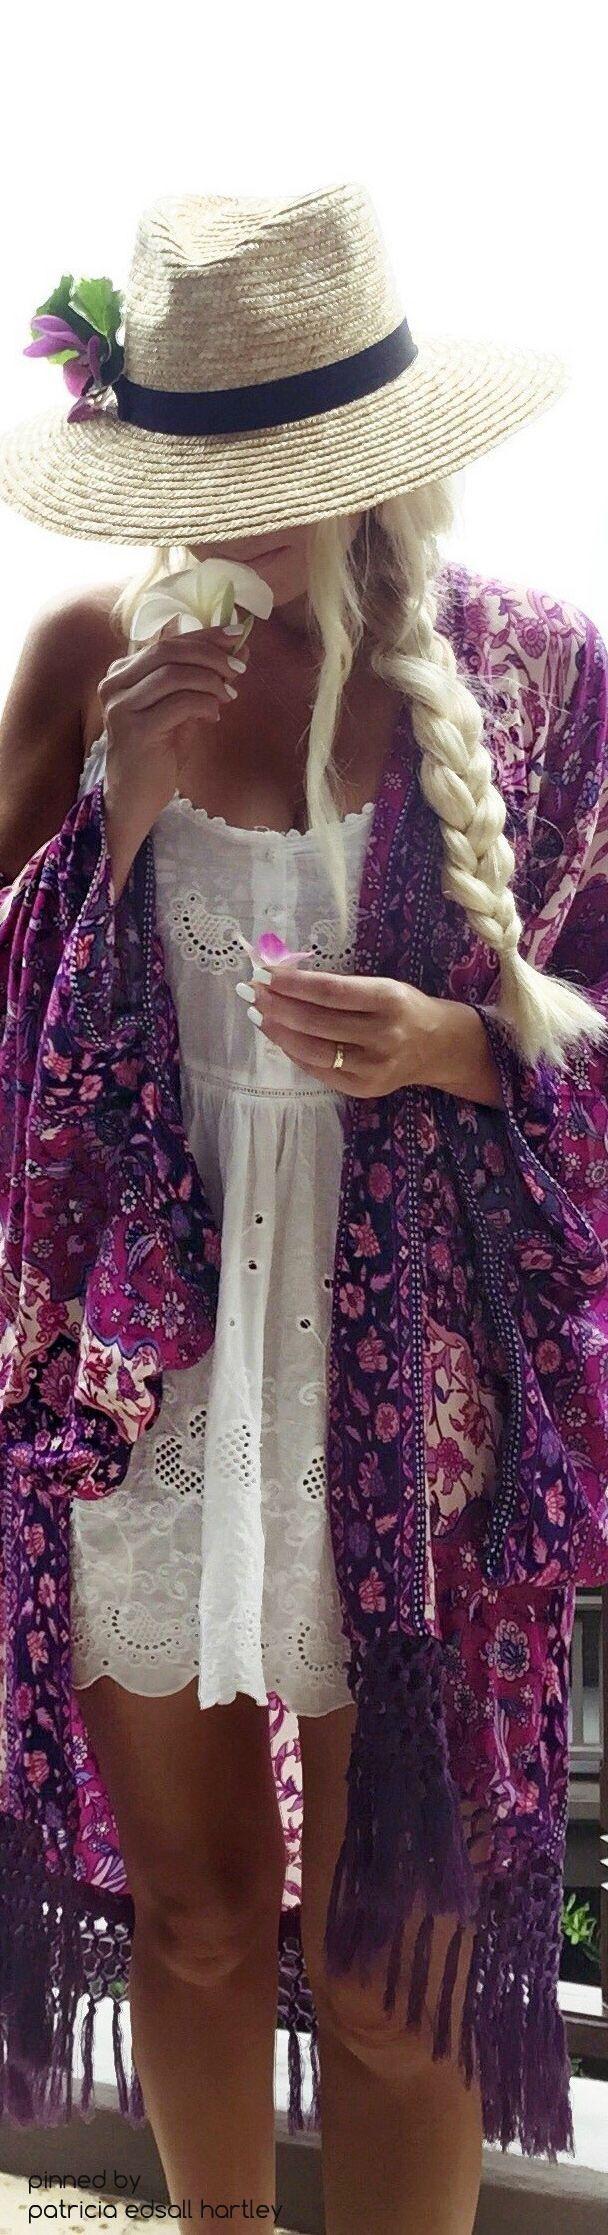 #boho #fashion #spring #outfitideas |Boho beach outfit idea